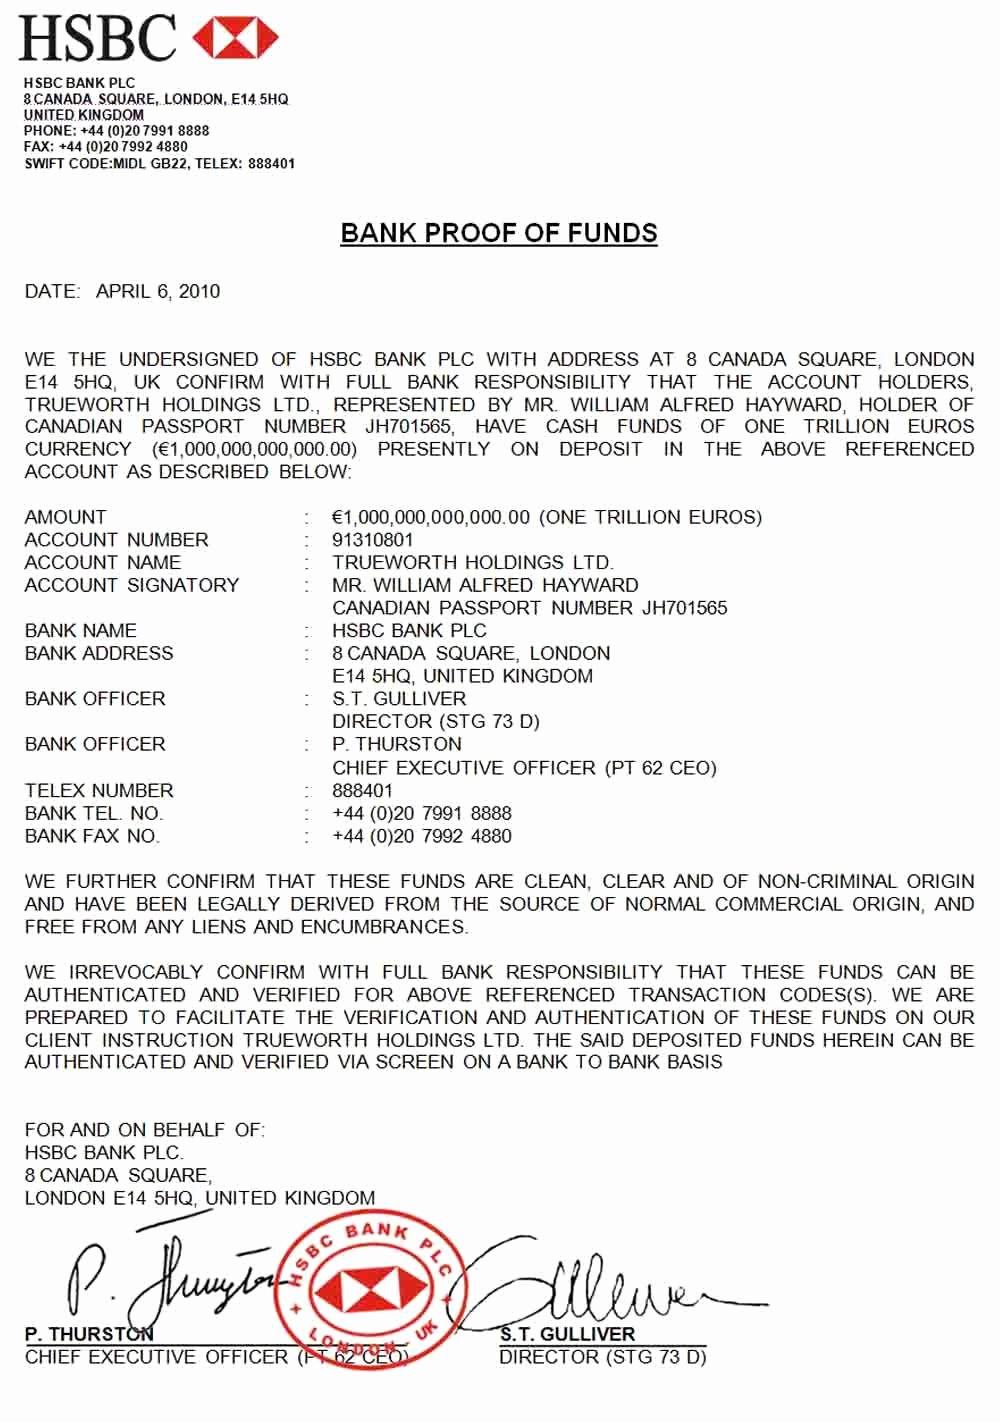 Sample Proof Of Funds Letter Template Lovely Bill Hayward Johannes Riyadi – Hsbc London 1t Pof